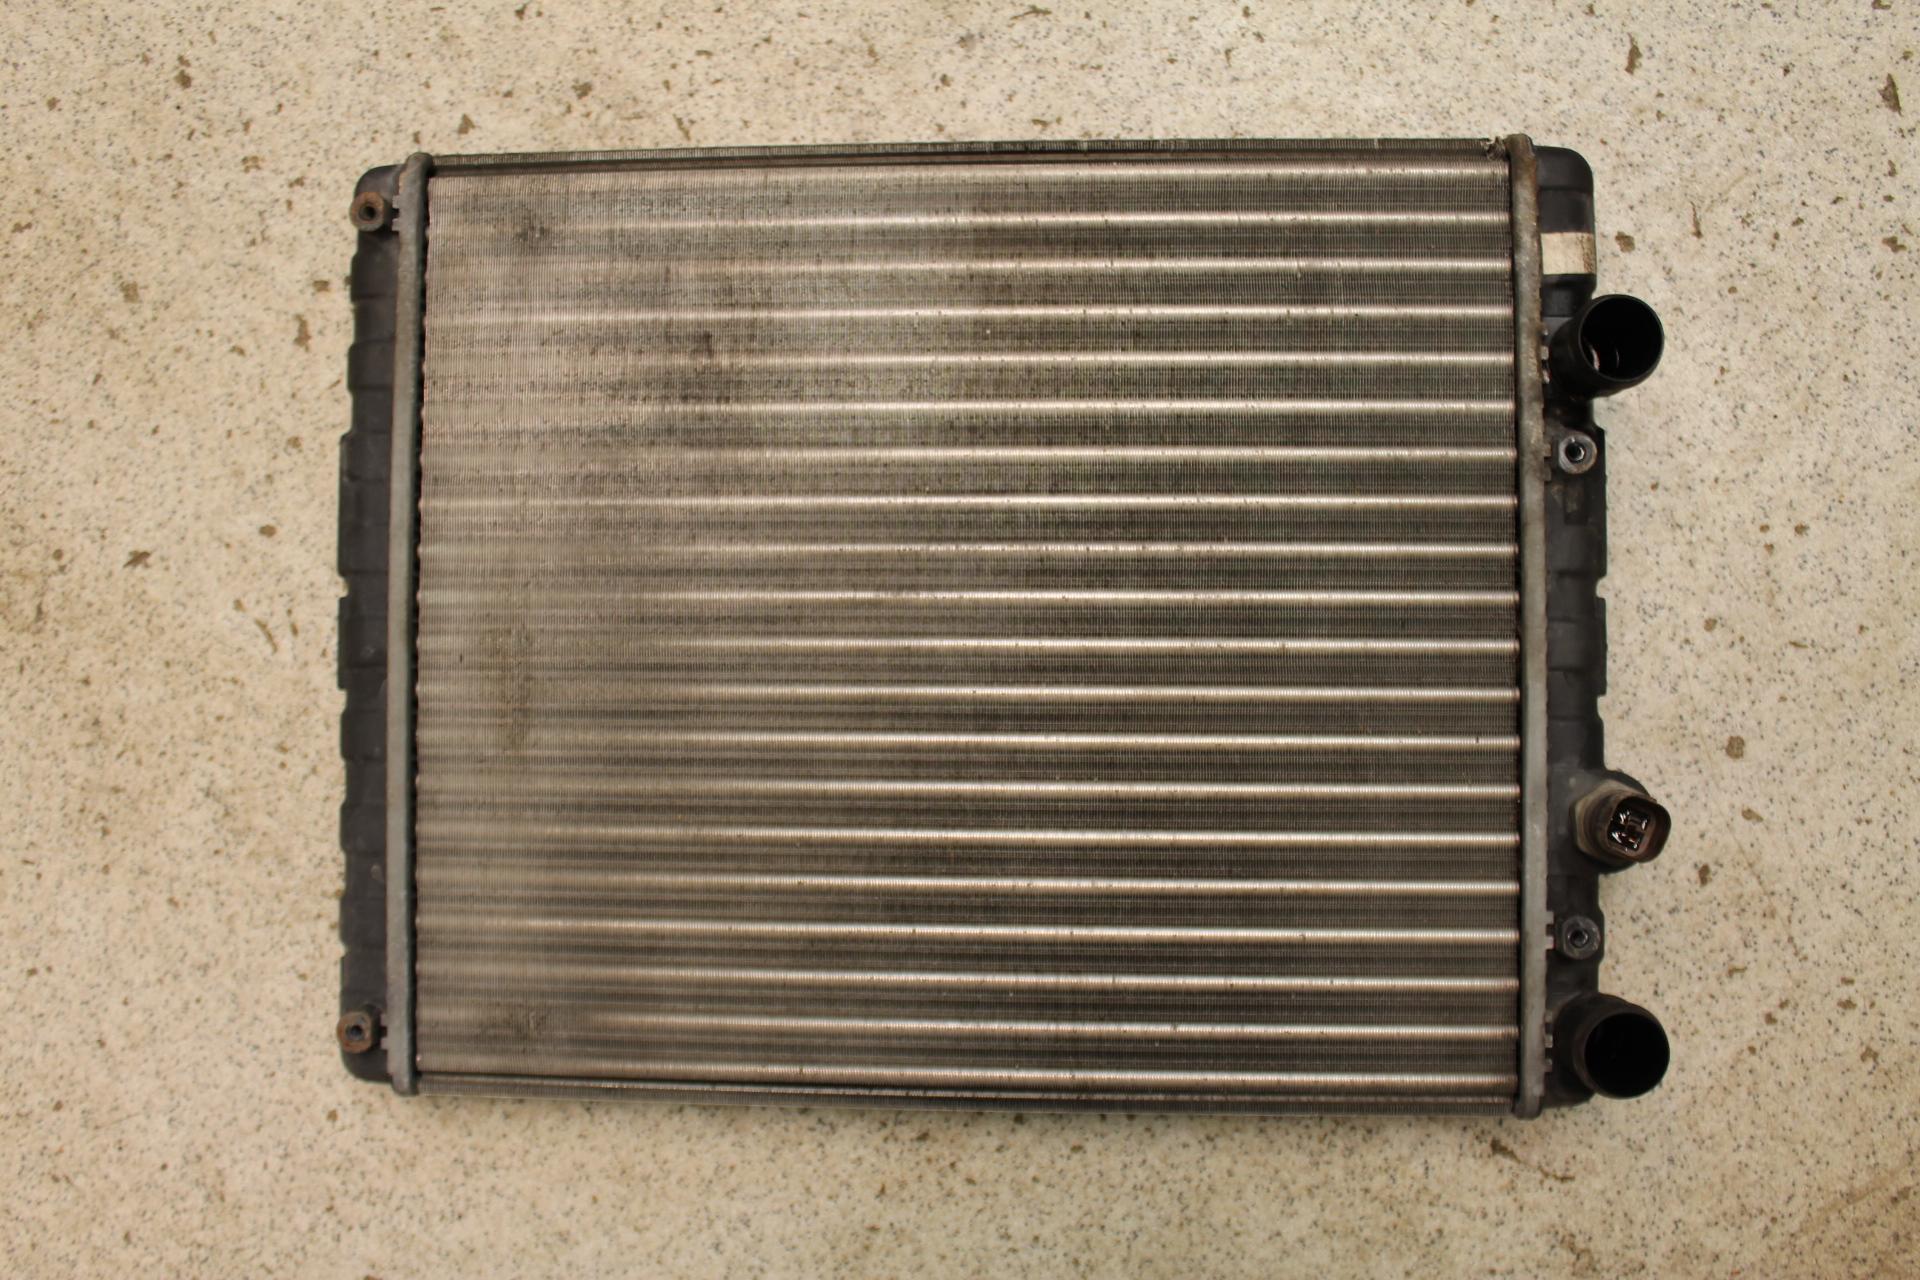 Kylare man - 325x520mm image